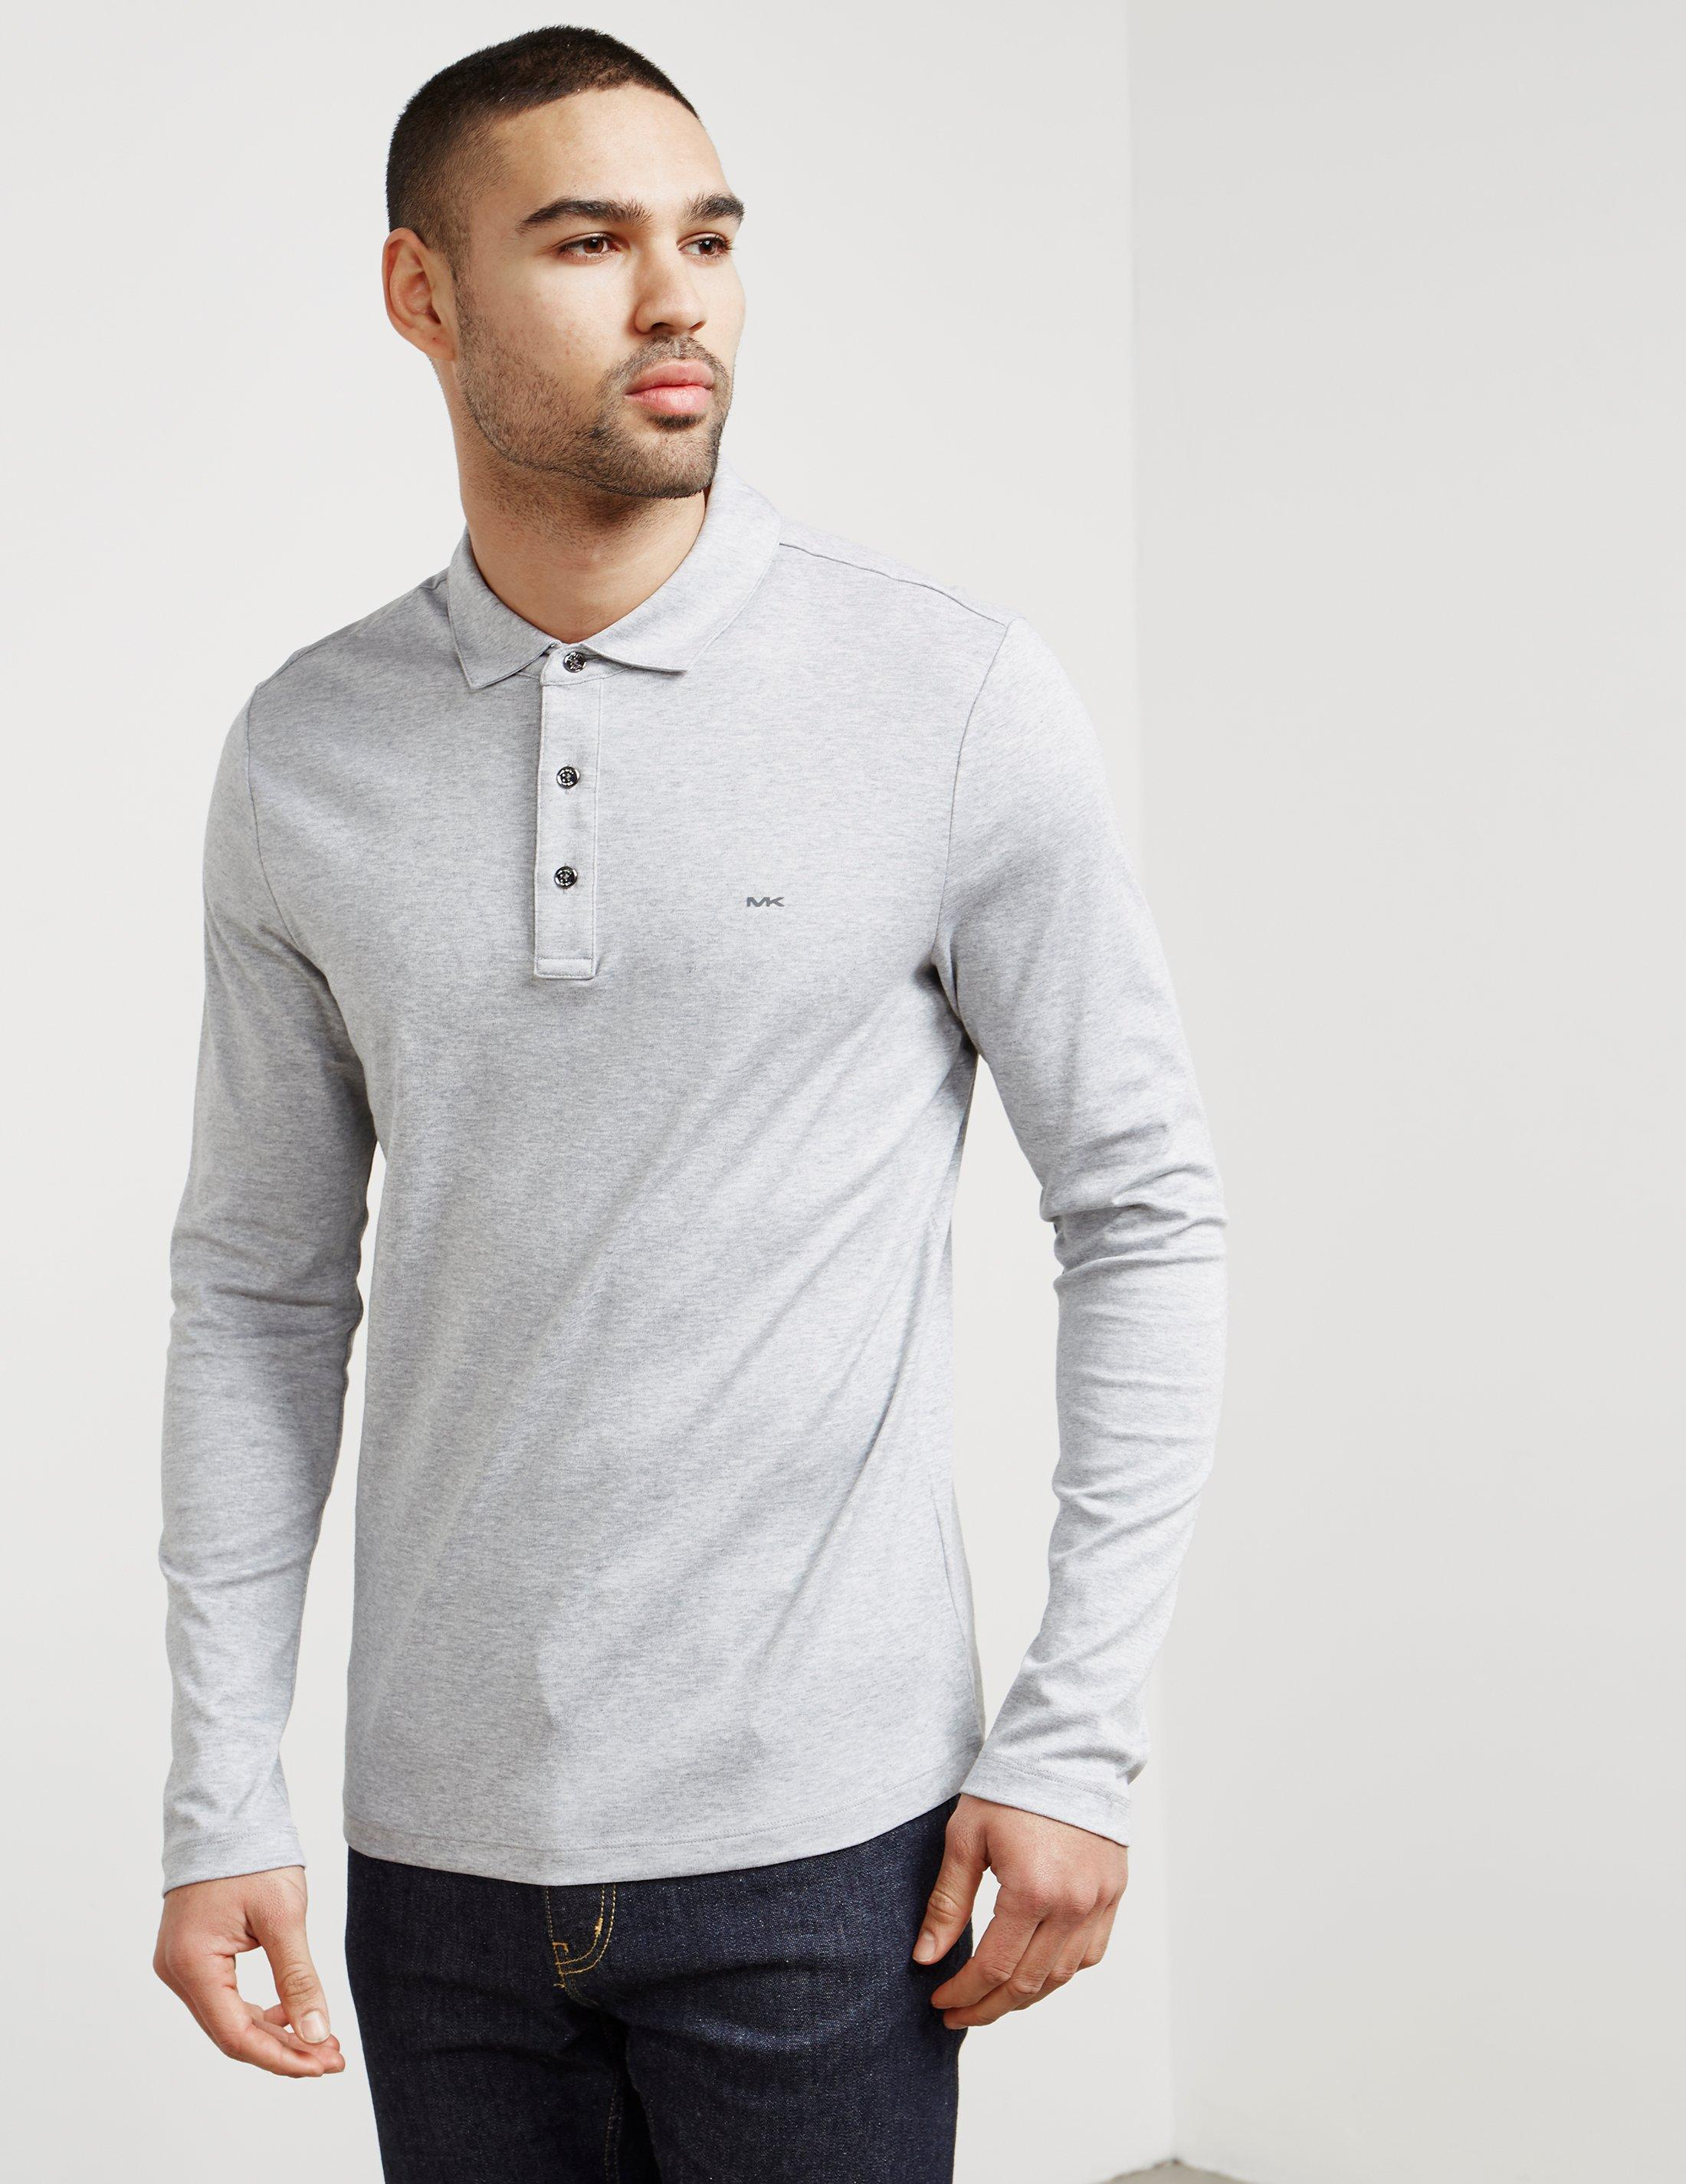 2899b481d Michael Kors Mens Sleek Long Sleeve Polo Shirt Grey in Gray for Men ...